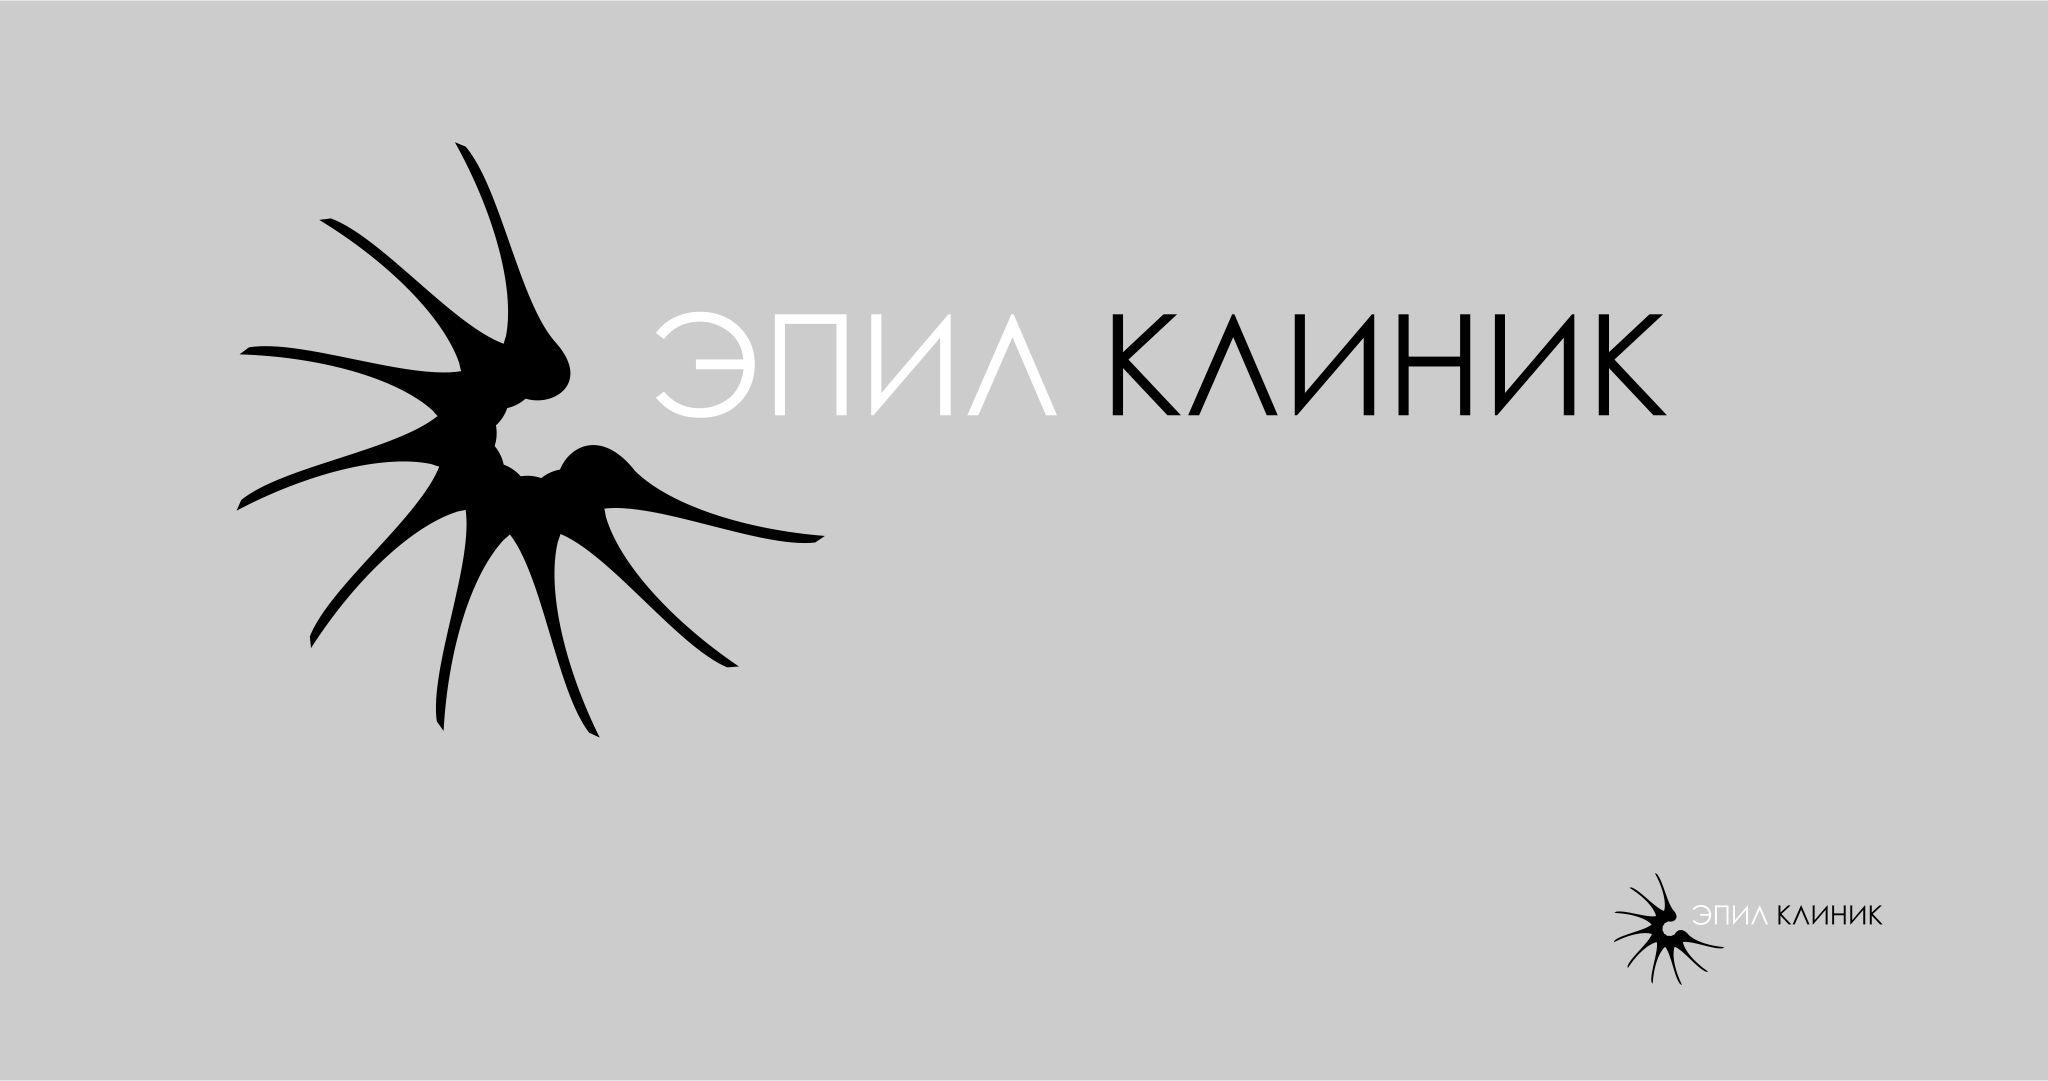 Логотип , фирменный стиль  фото f_0025e196a0444ed5.jpg